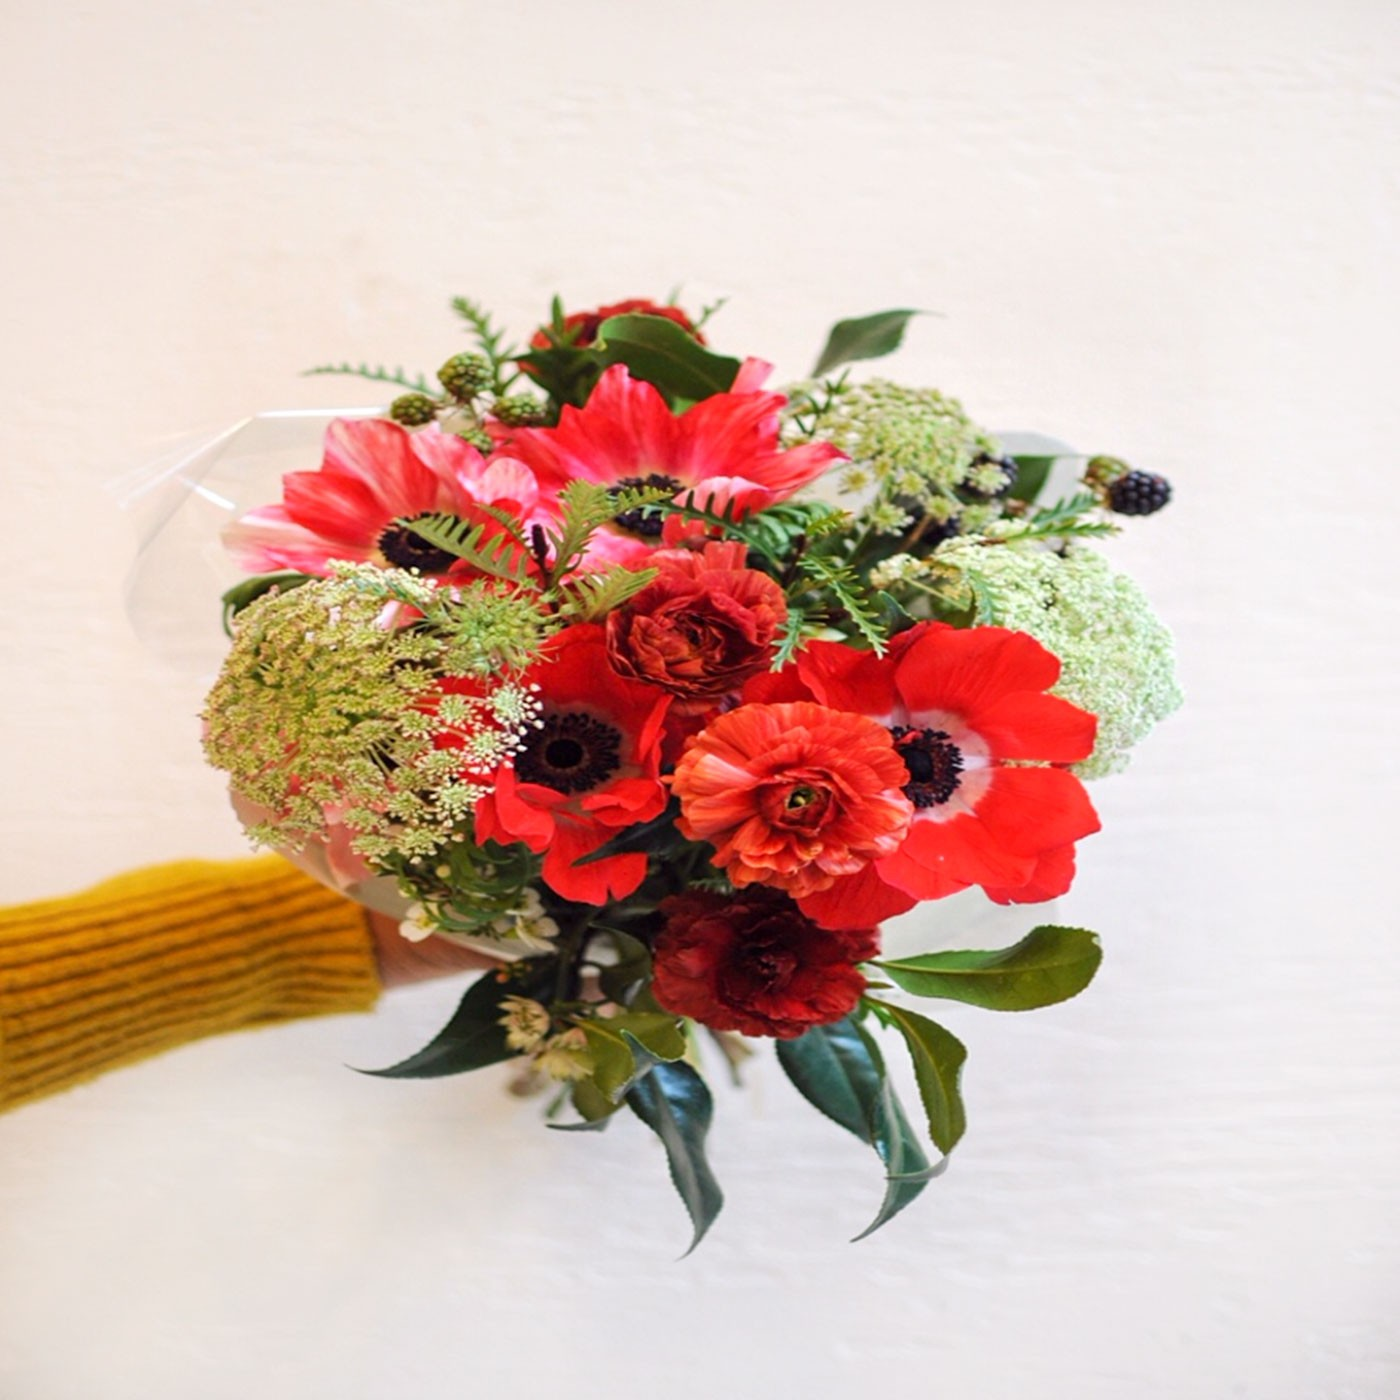 Hand-tied Flower Bouquet, 10 Stems - Il Fiorista | Eataly.com